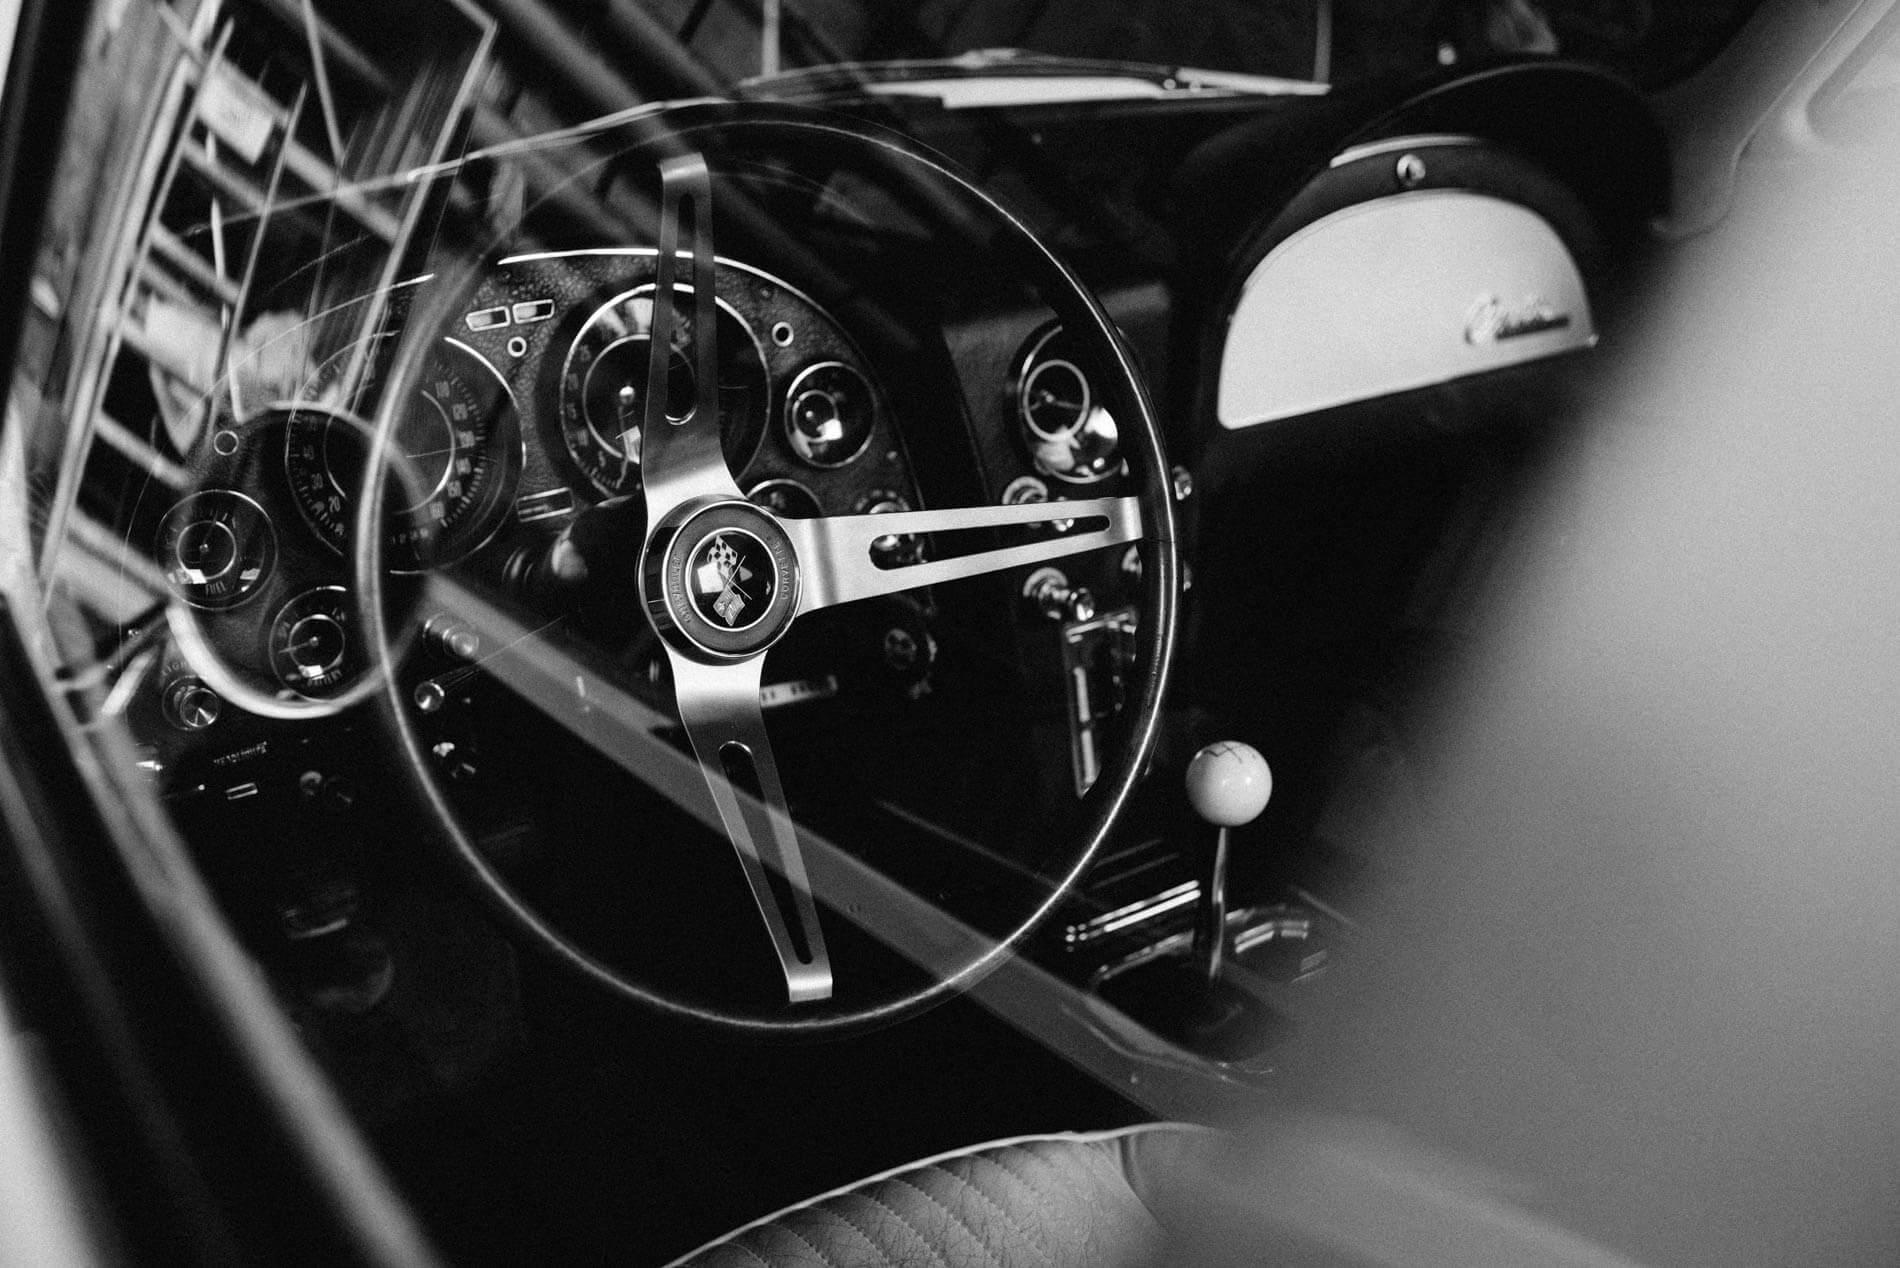 US Car Classics sascha hoecker kramm newsletter us cars classic 17